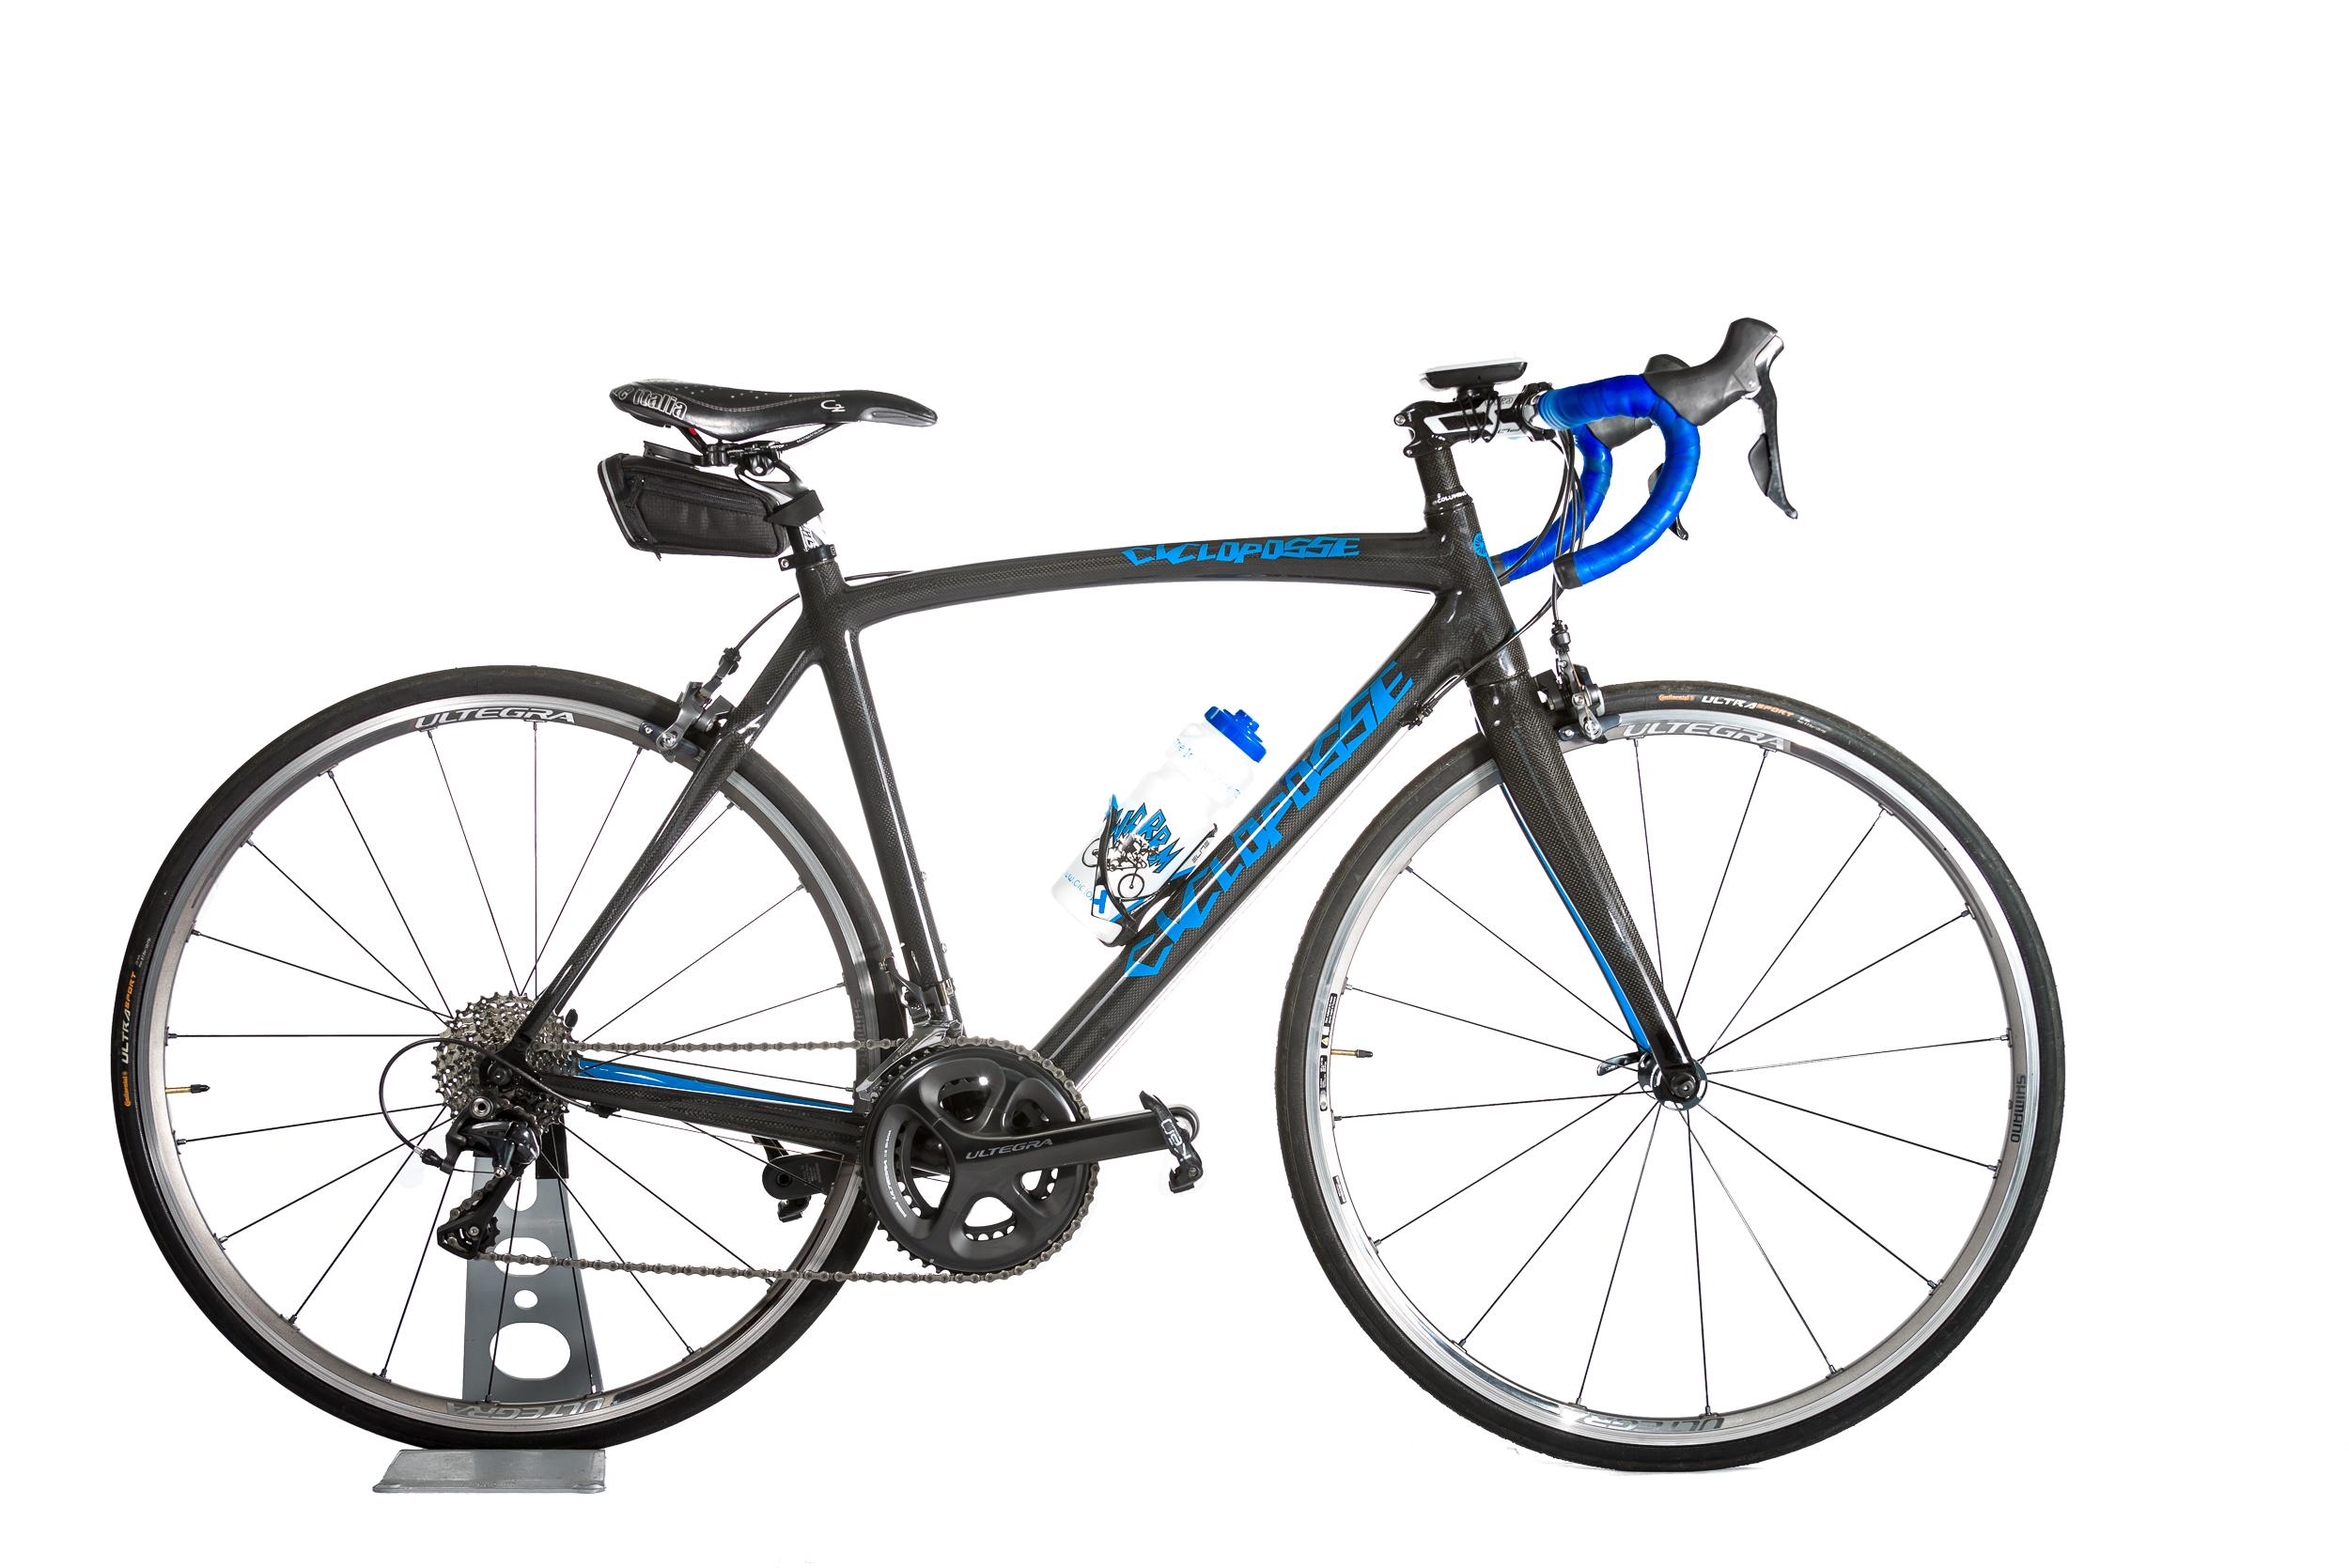 noleggio bici da corsa in toscana